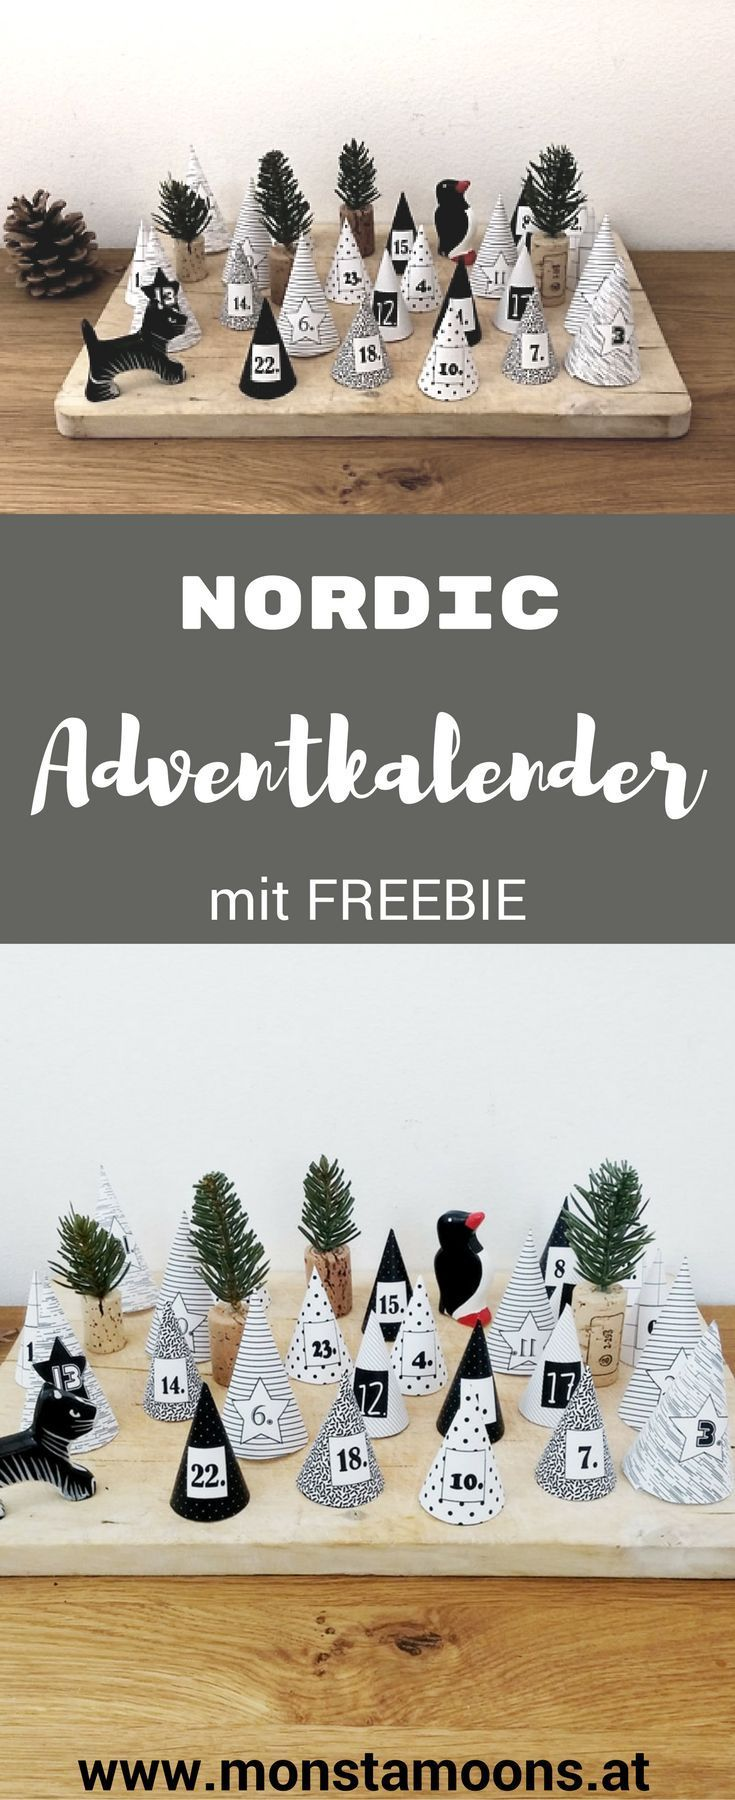 Nordic Adventkalender mit Freebie